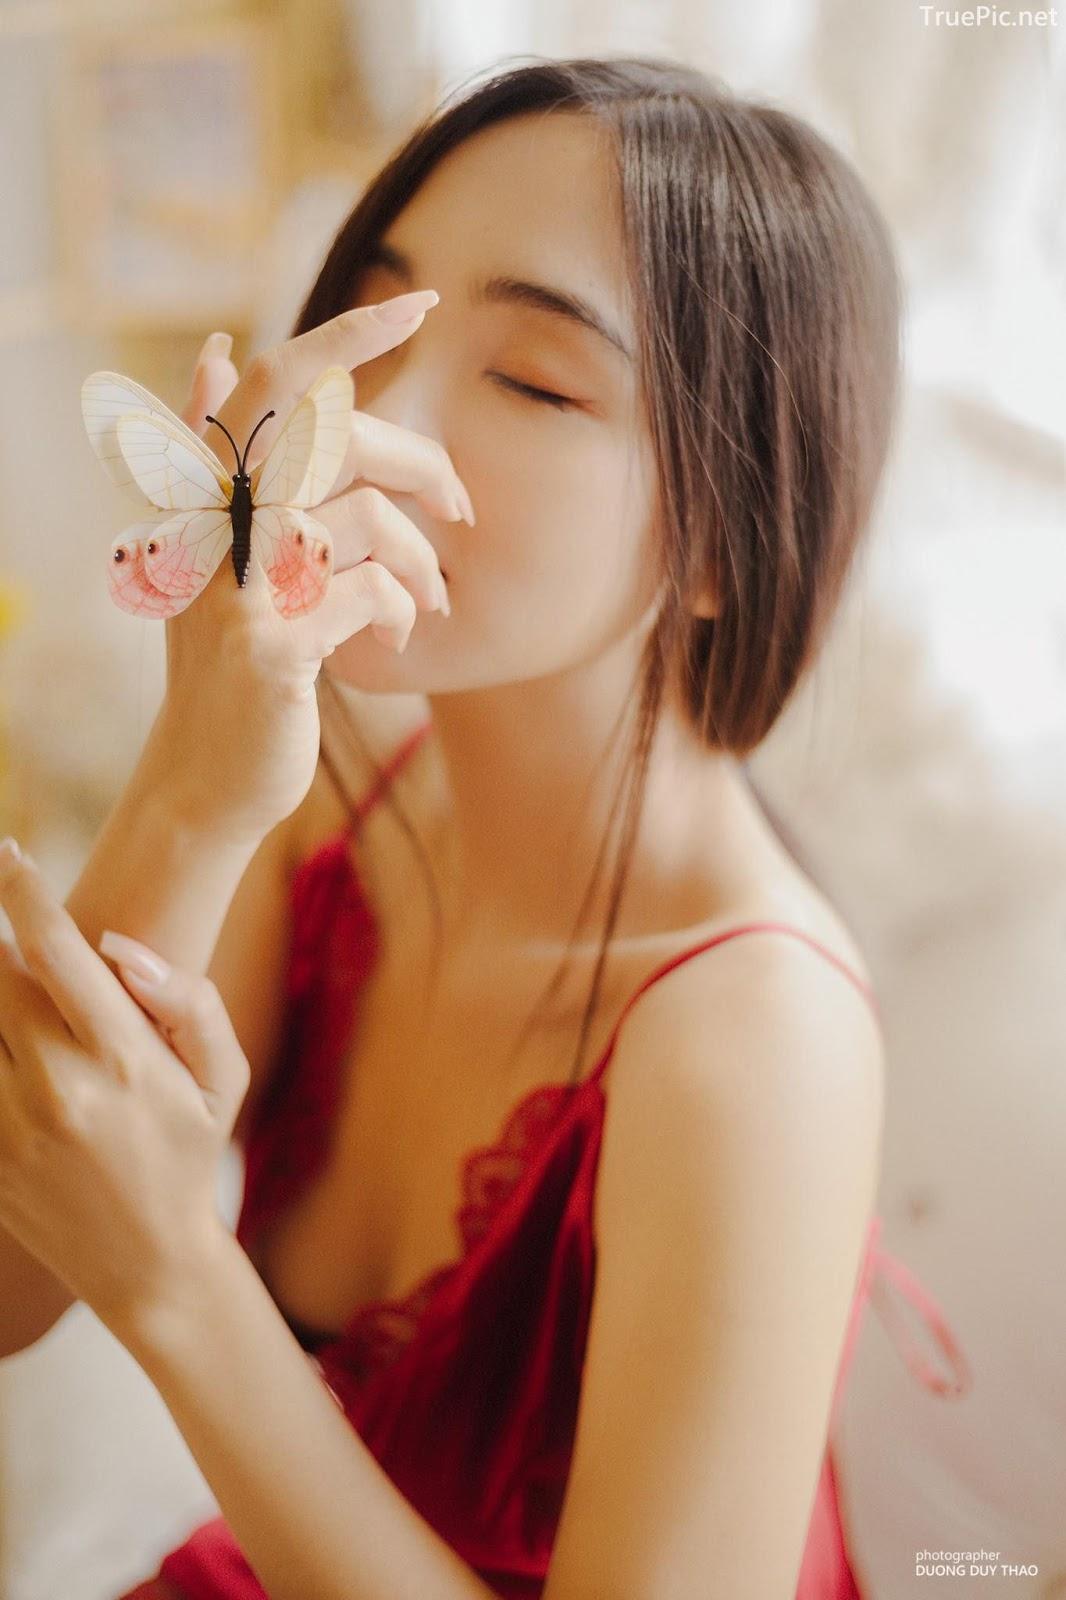 Vietnamese hot girl model Hua Thao Nguyen - She is a beautiful butterfly - Picture 2